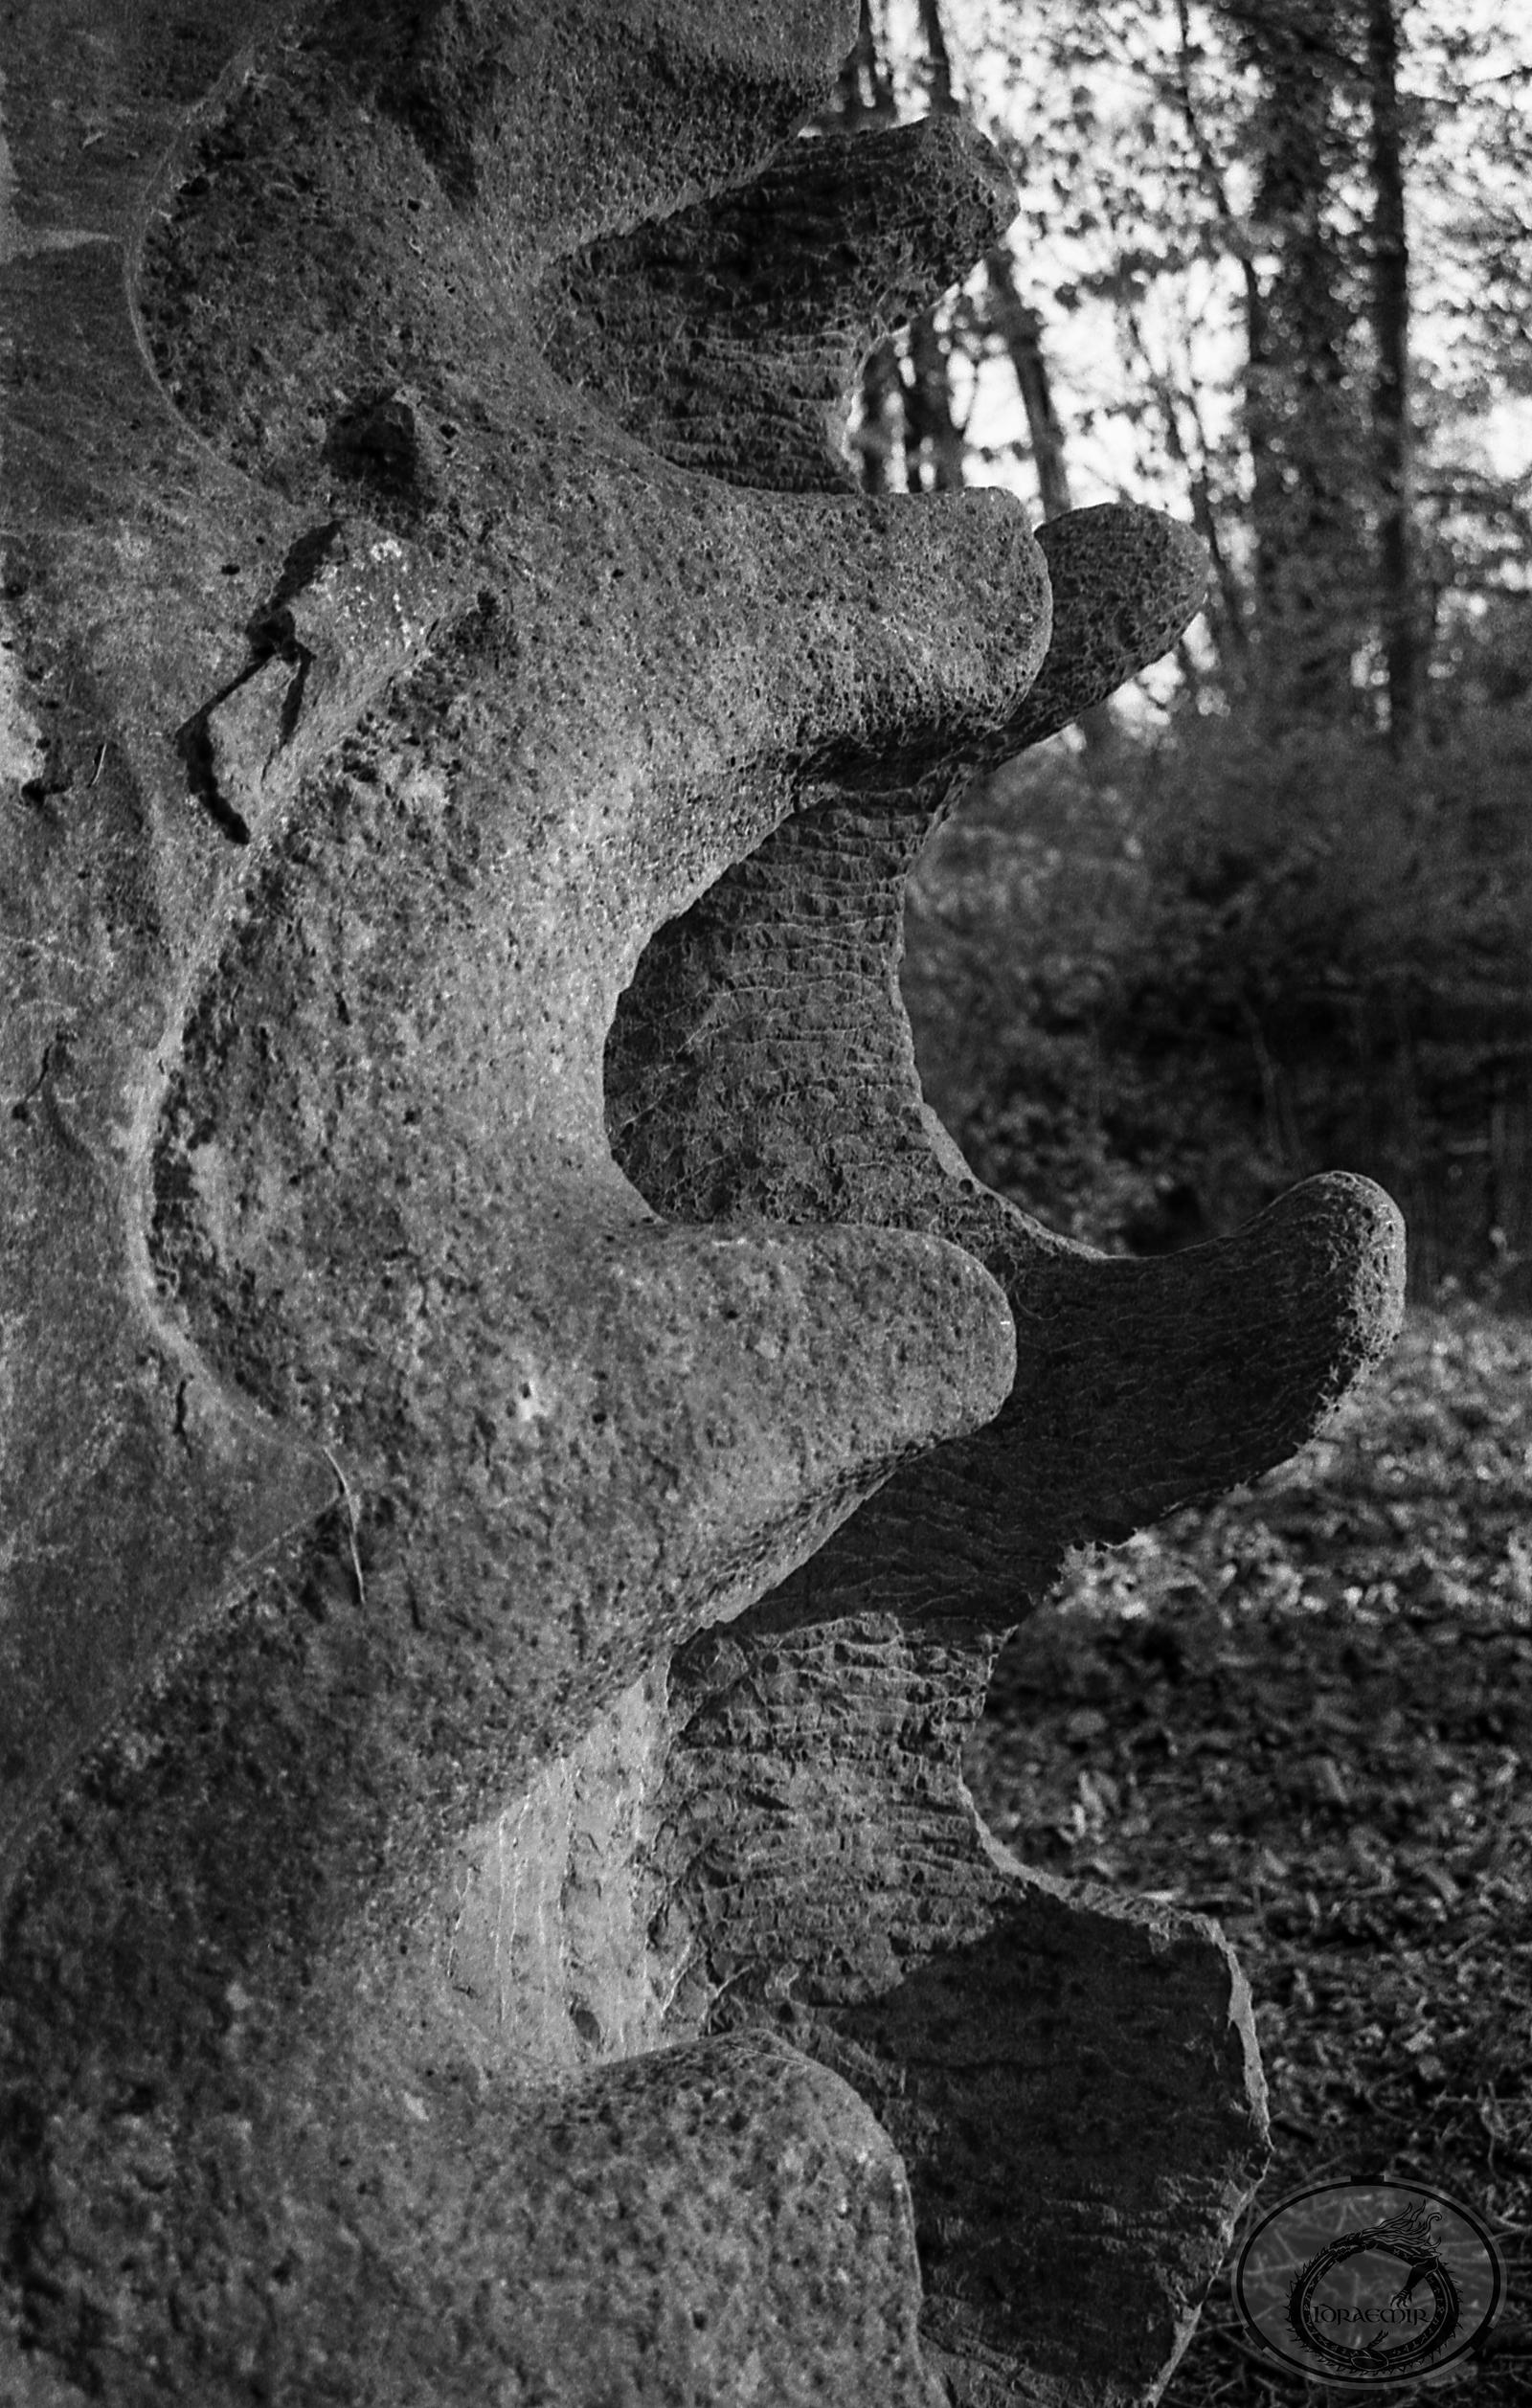 Stone Jaws by Idraemir